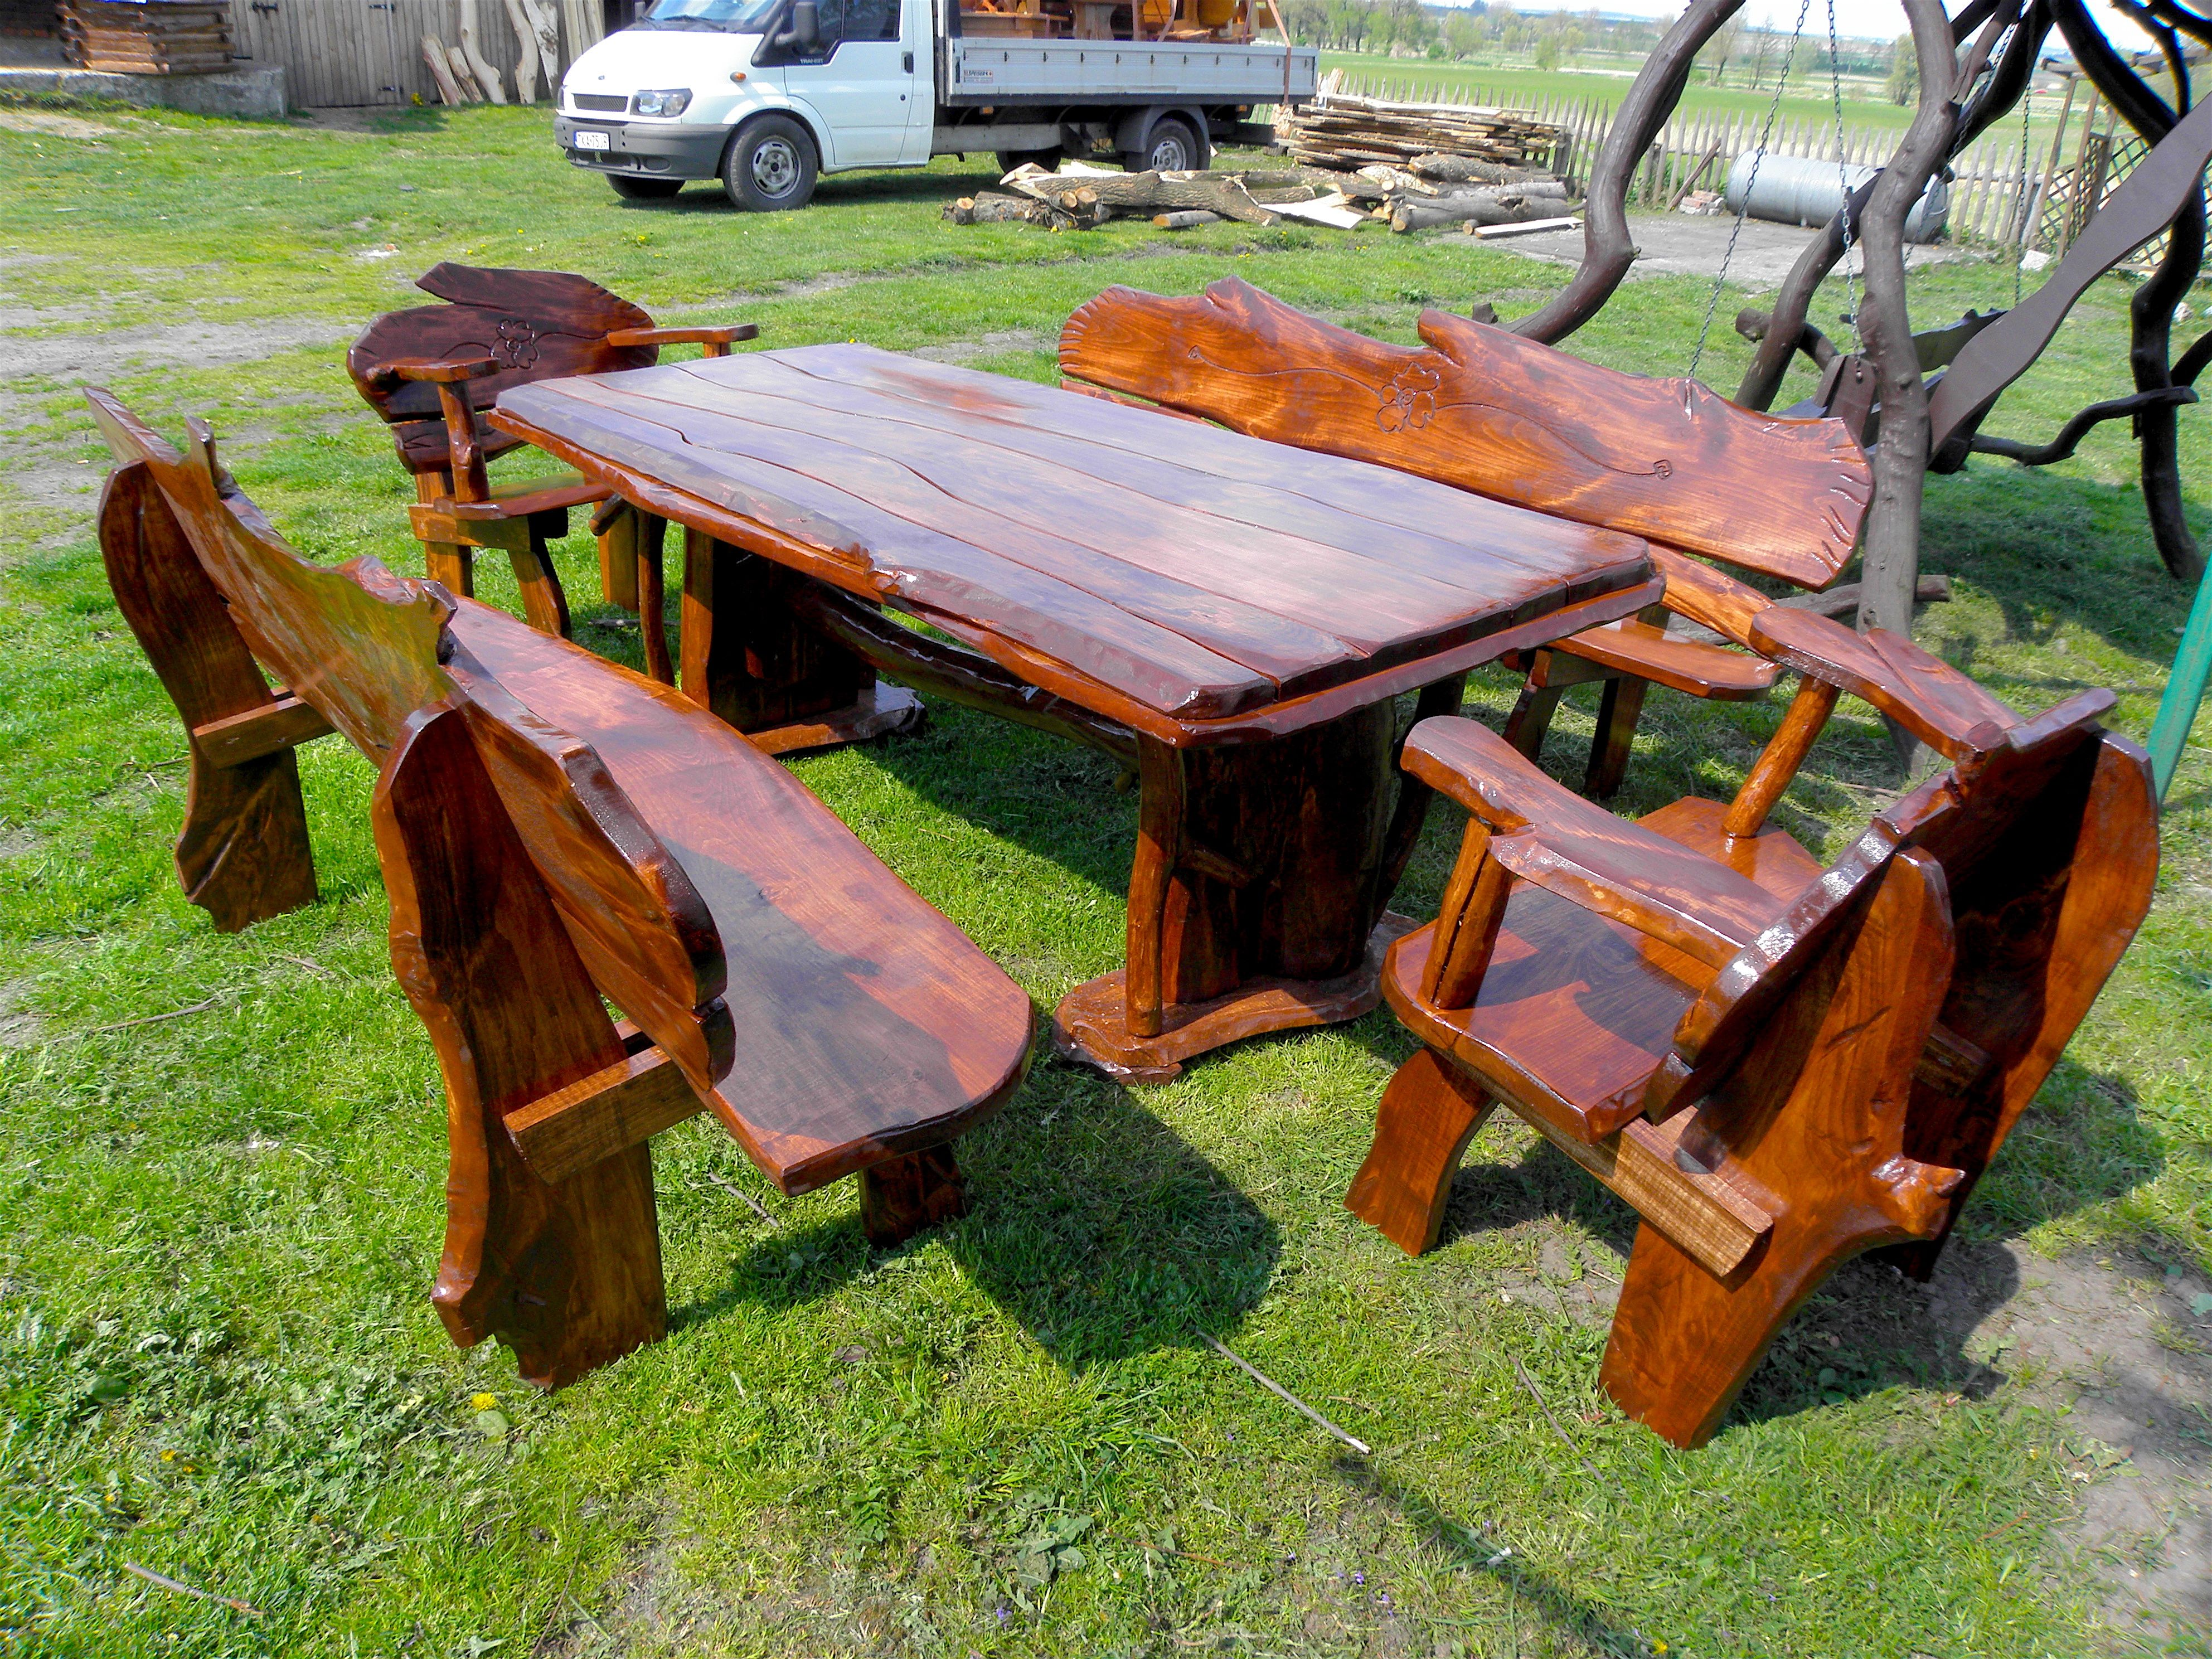 Meble Ogrodowe Z Drewna Olchowego Picnic Table Table Decor